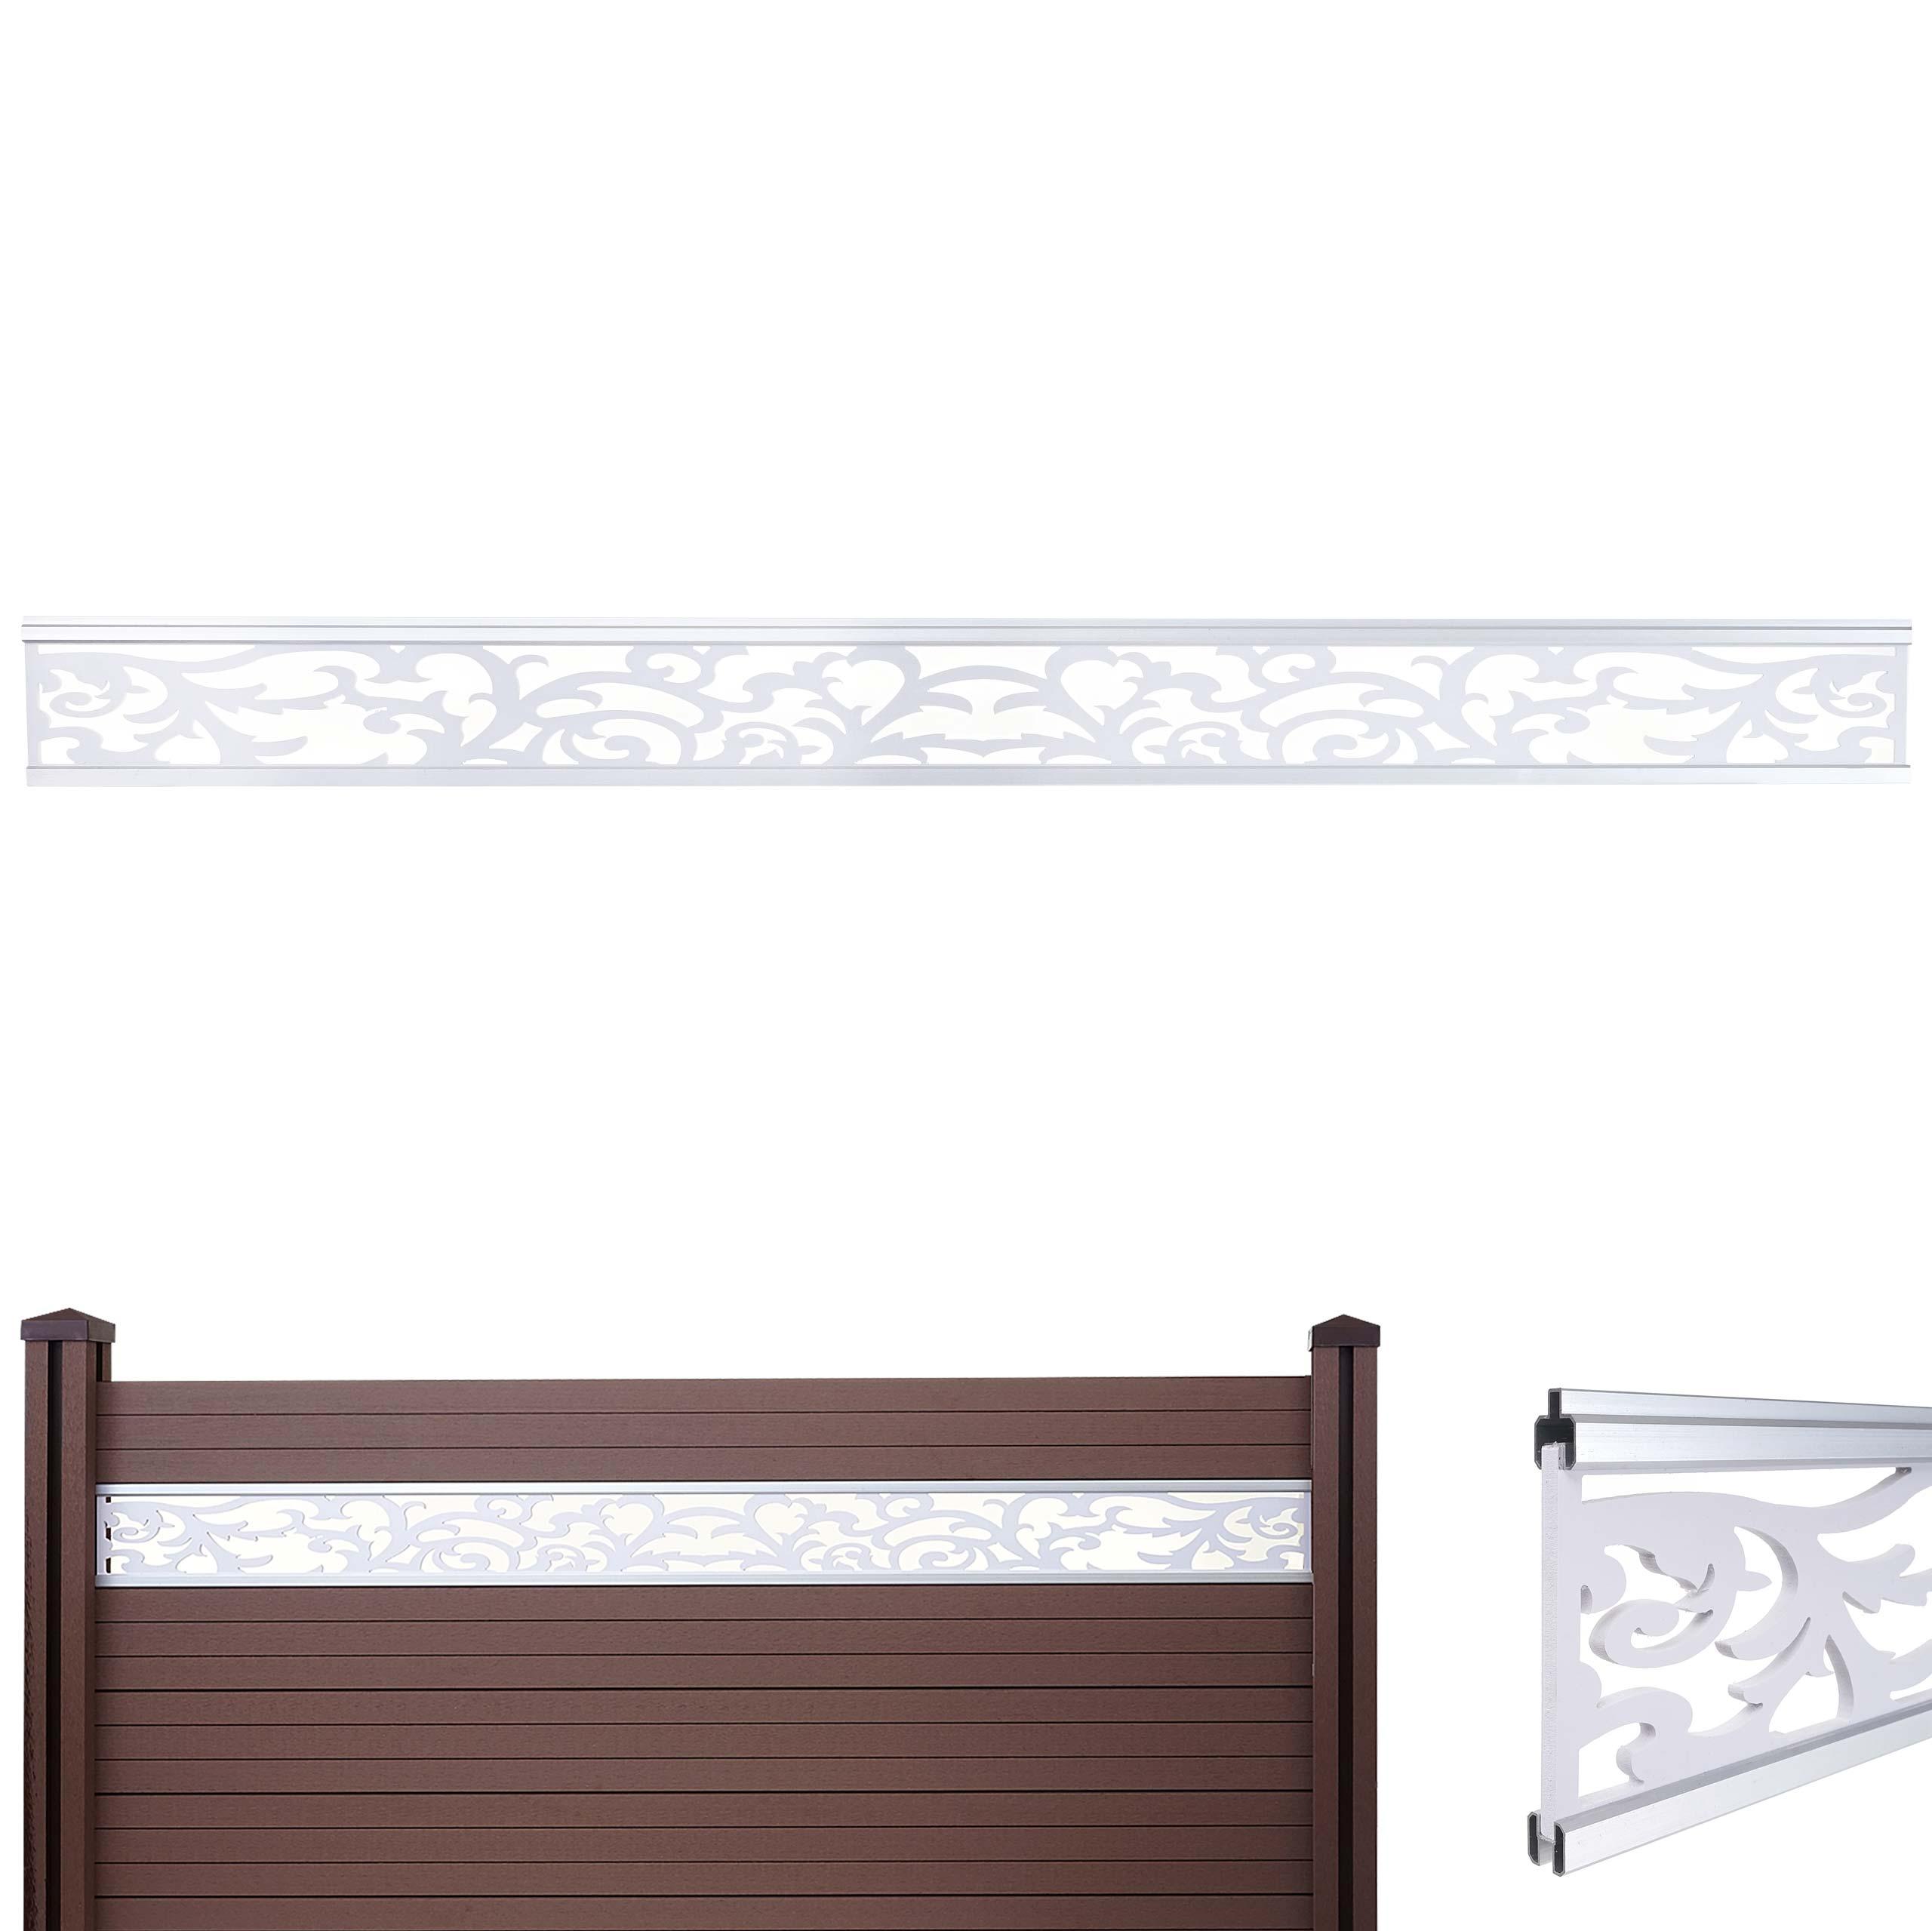 Dekopaneel Fur Wpc Sichtschutz Sarthe Verkleidung 16x177cm Weiss